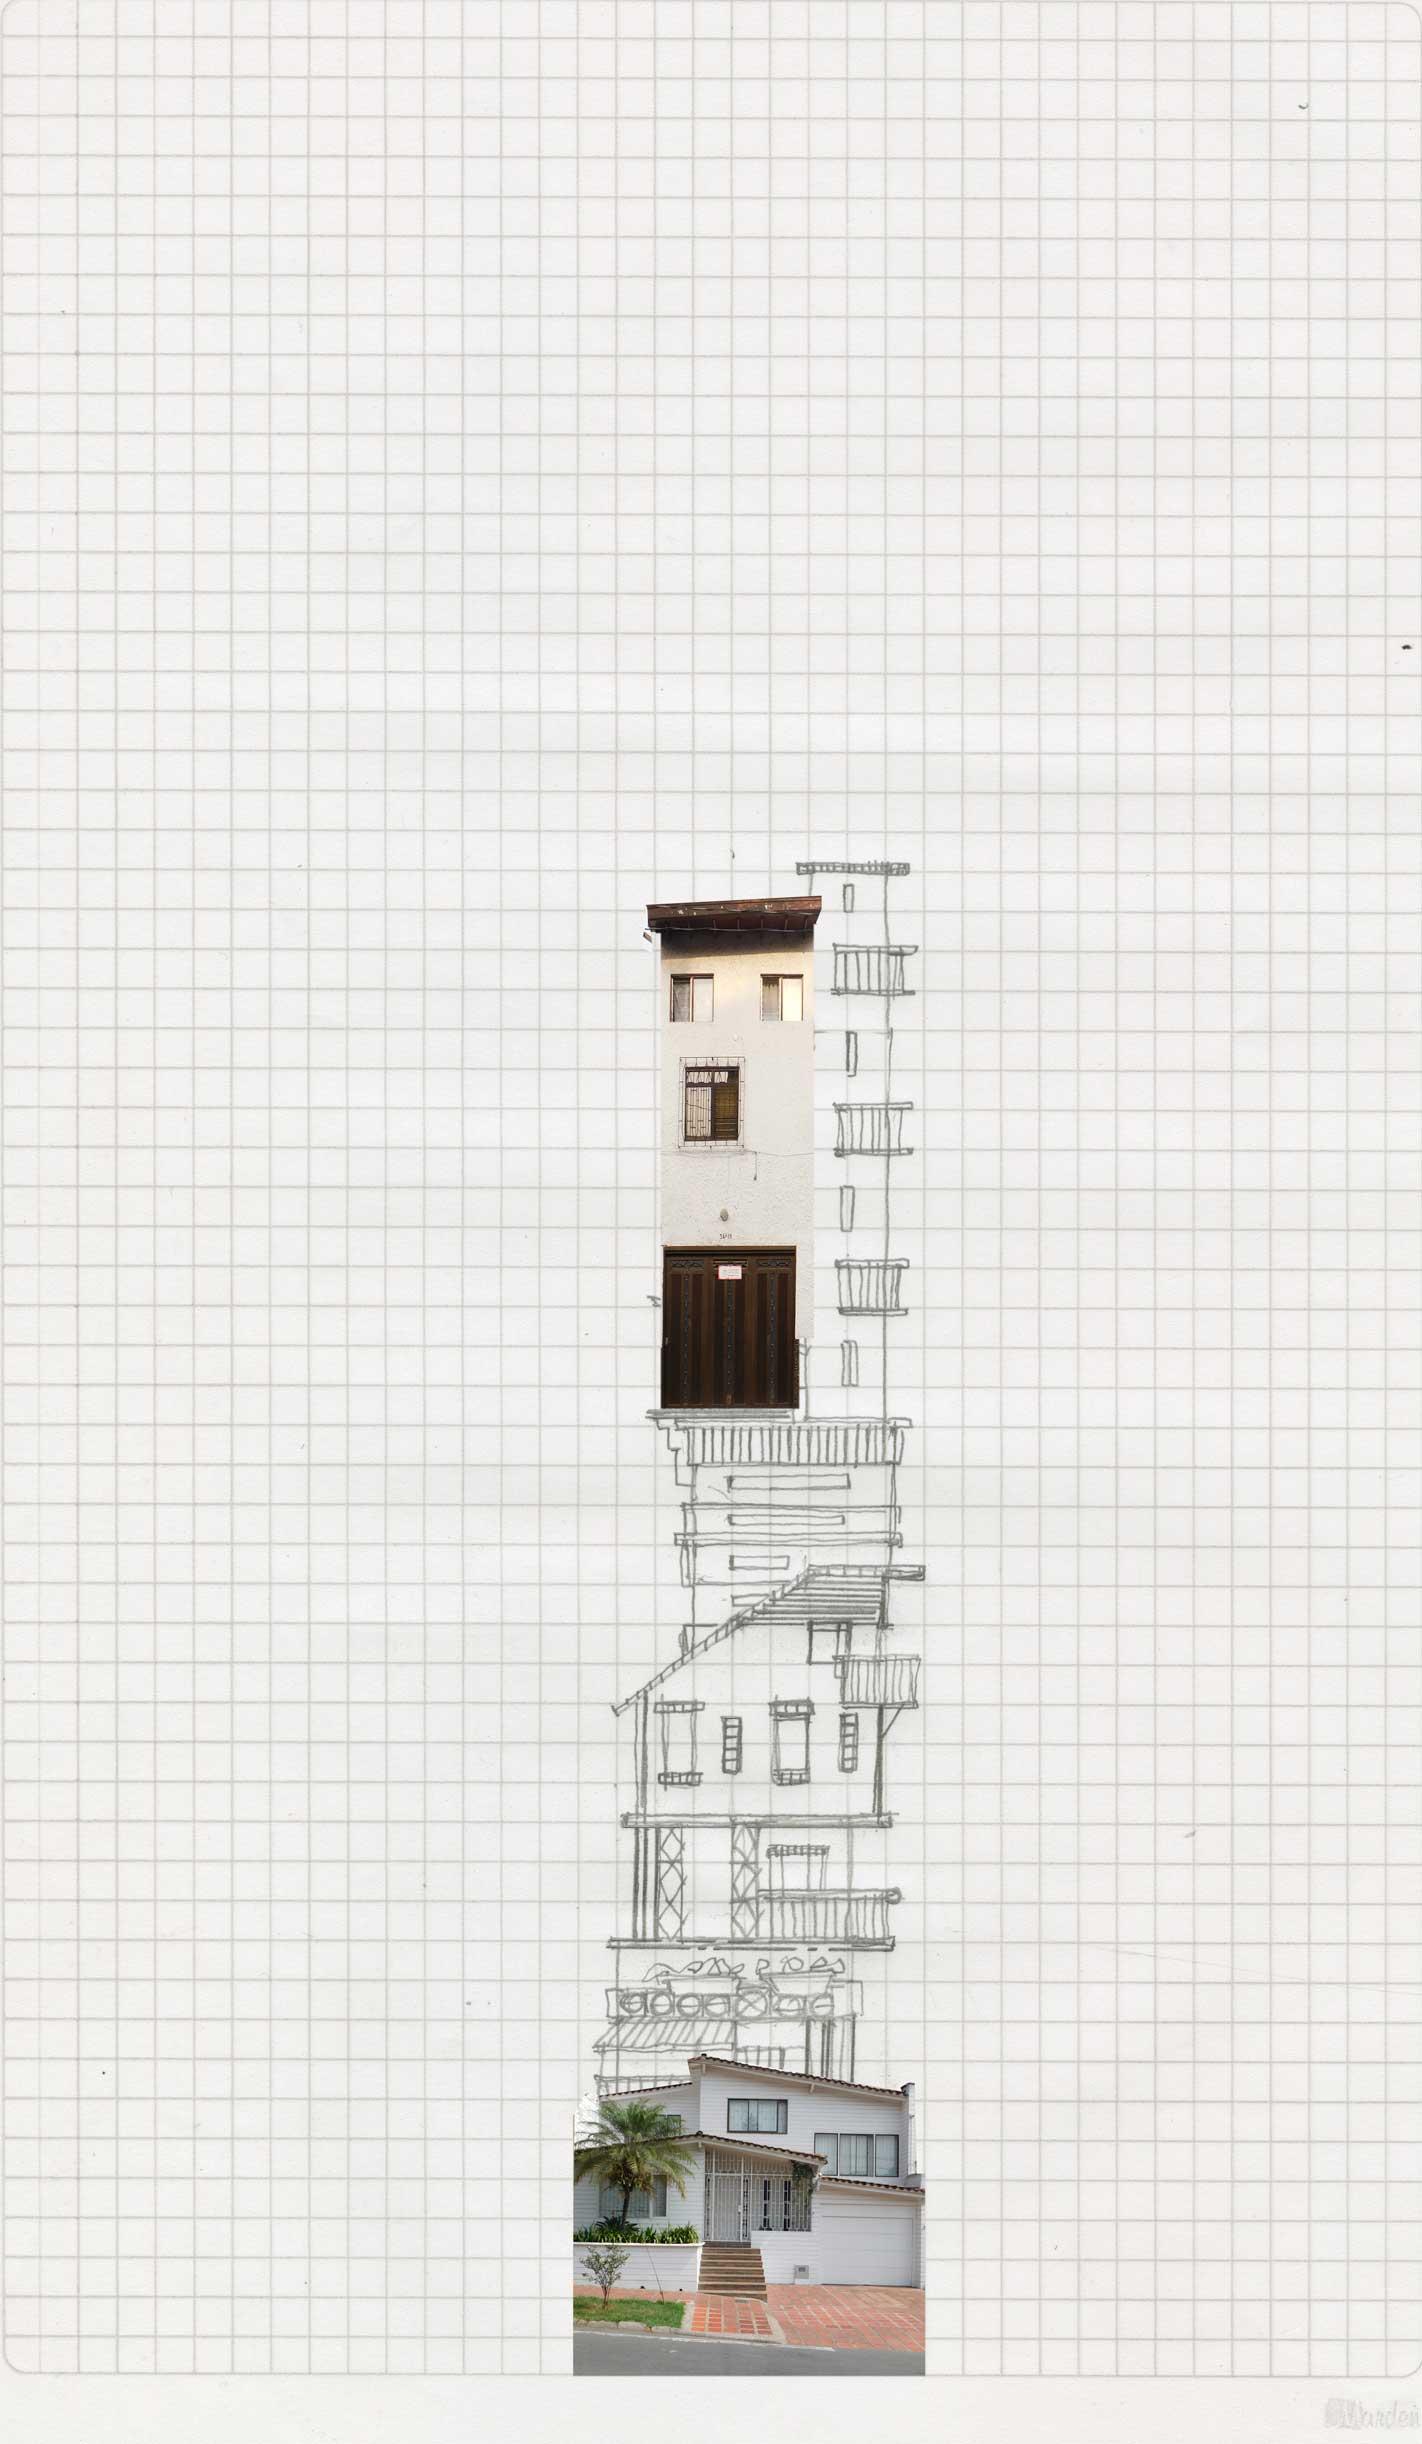 medellin_house_web_mashup_10